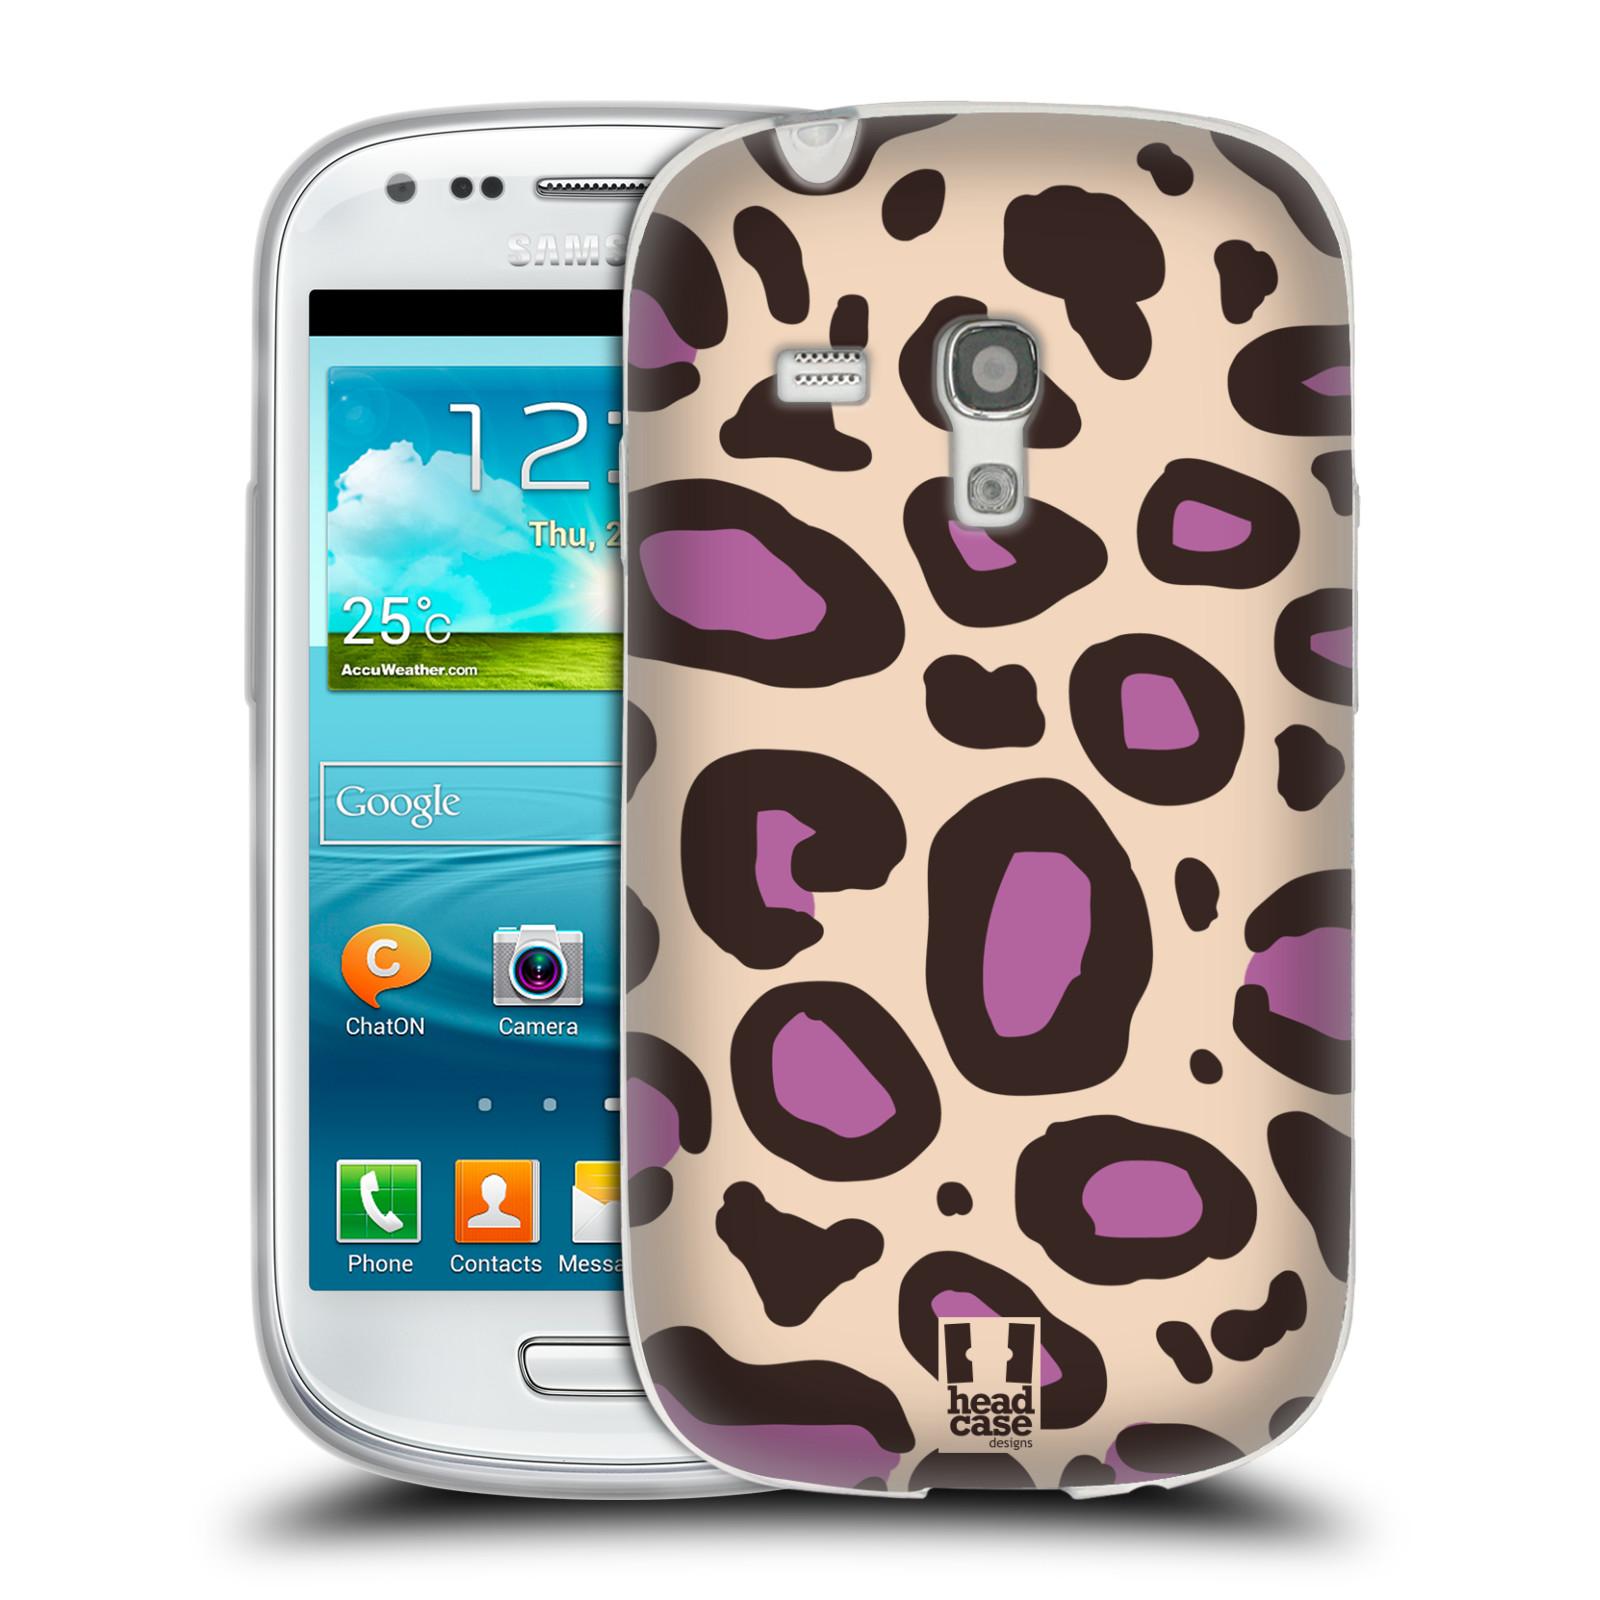 HEAD CASE silikonový obal na mobil Samsung Galaxy S3 MINI i8190 vzor Divočina zvíře 2 neutrální fialová